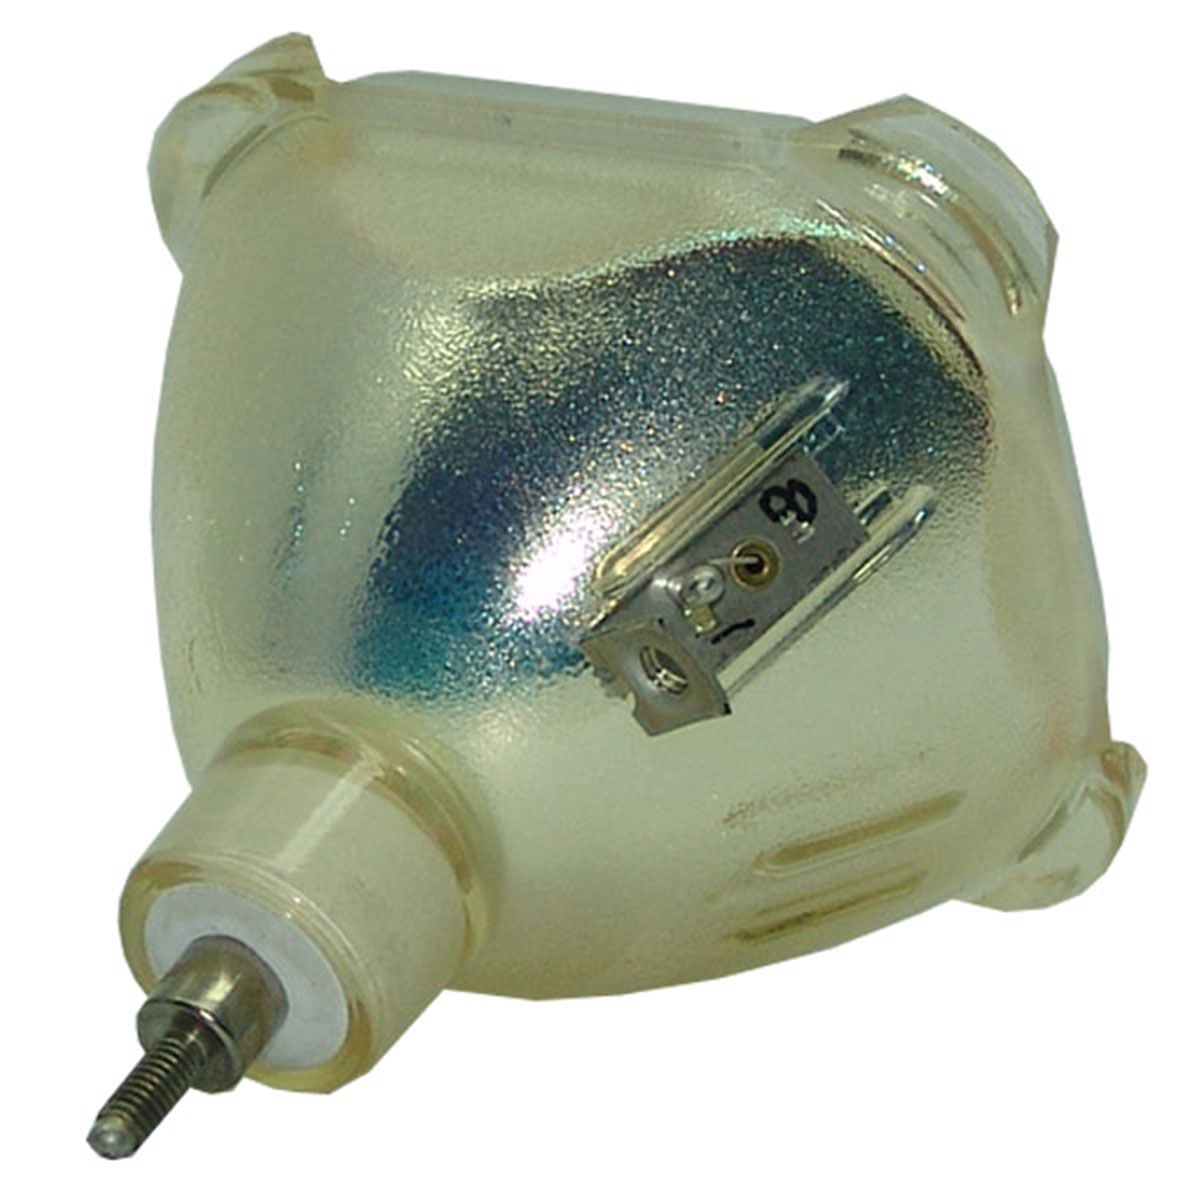 Original Philips Projector Lamp Replacement for InFocus LP690 (Bulb Only) - image 2 de 5